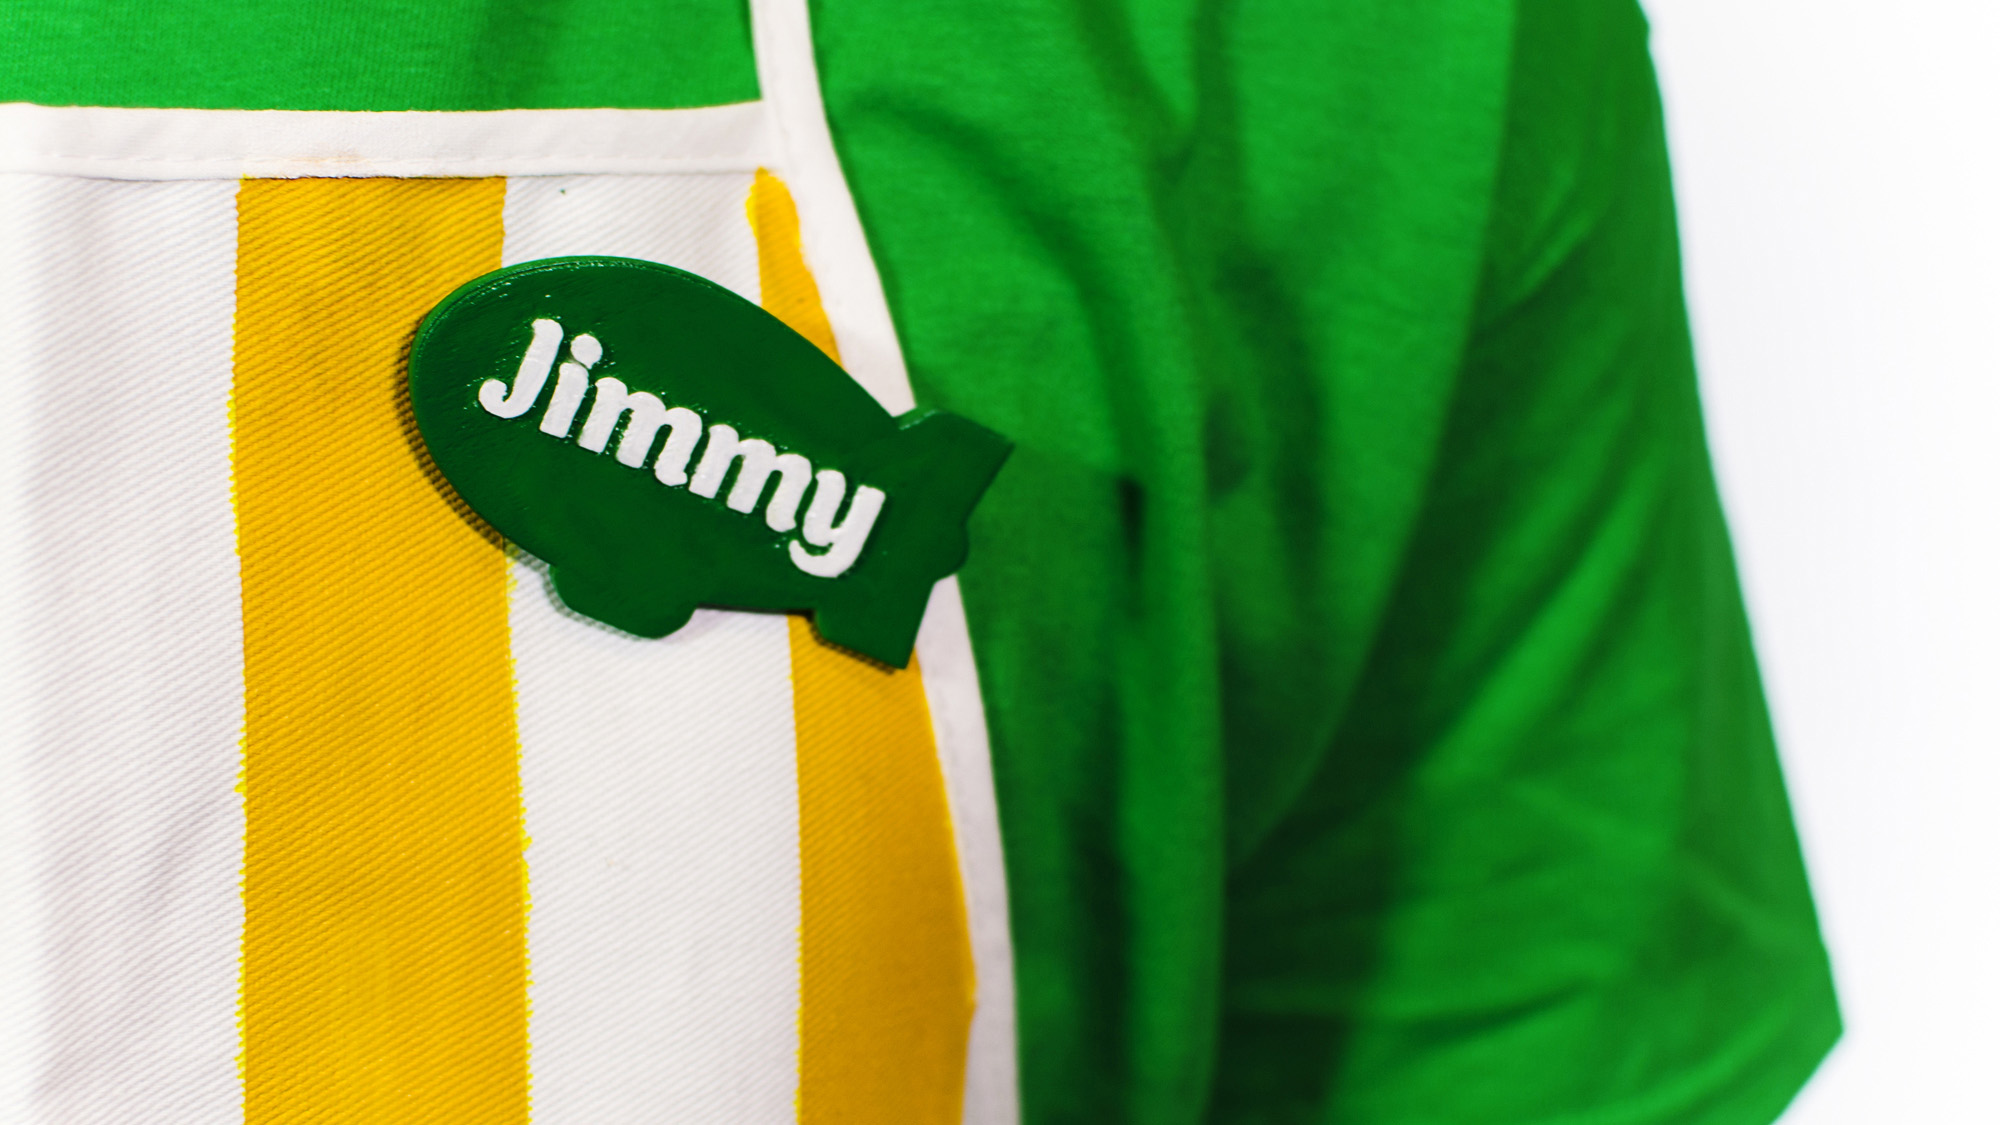 Jimmy_nametag2.jpg